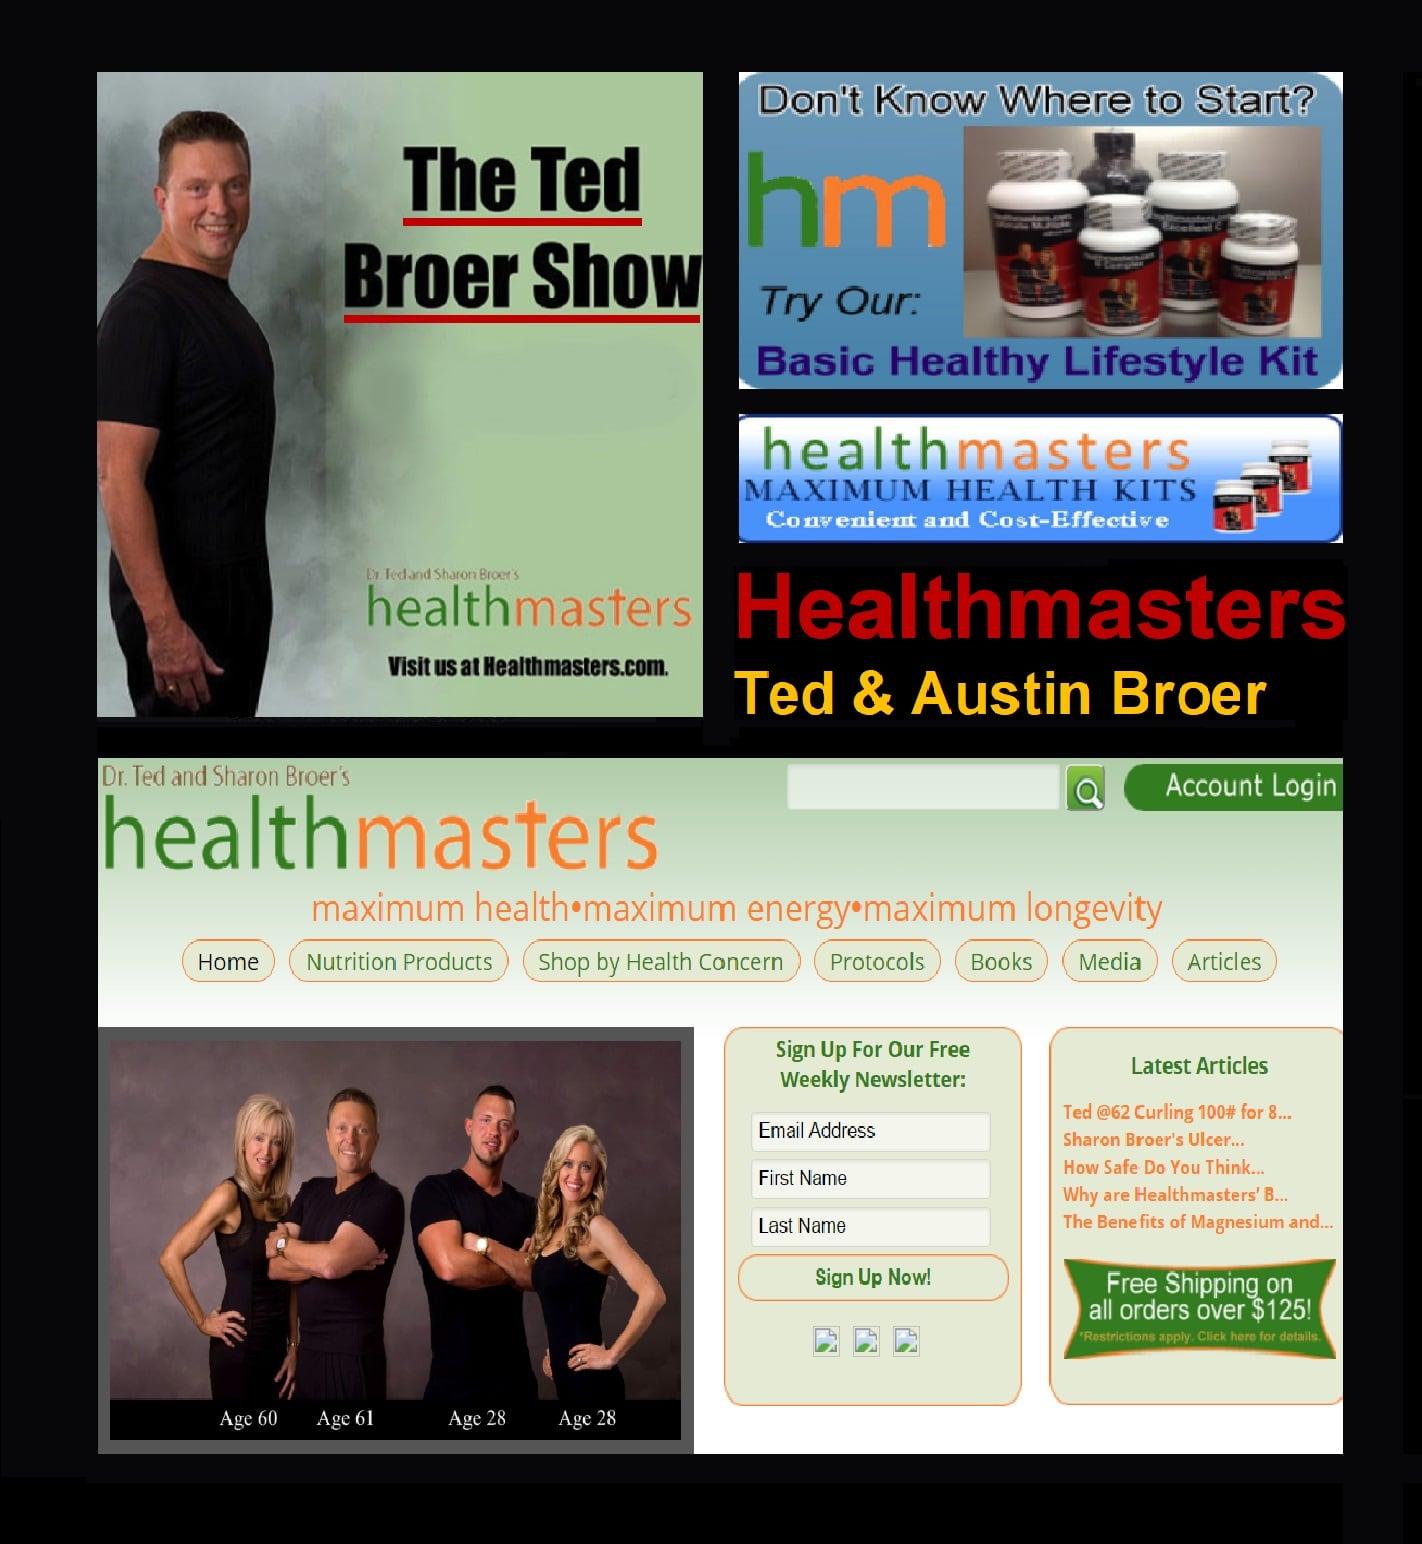 Healthmasters